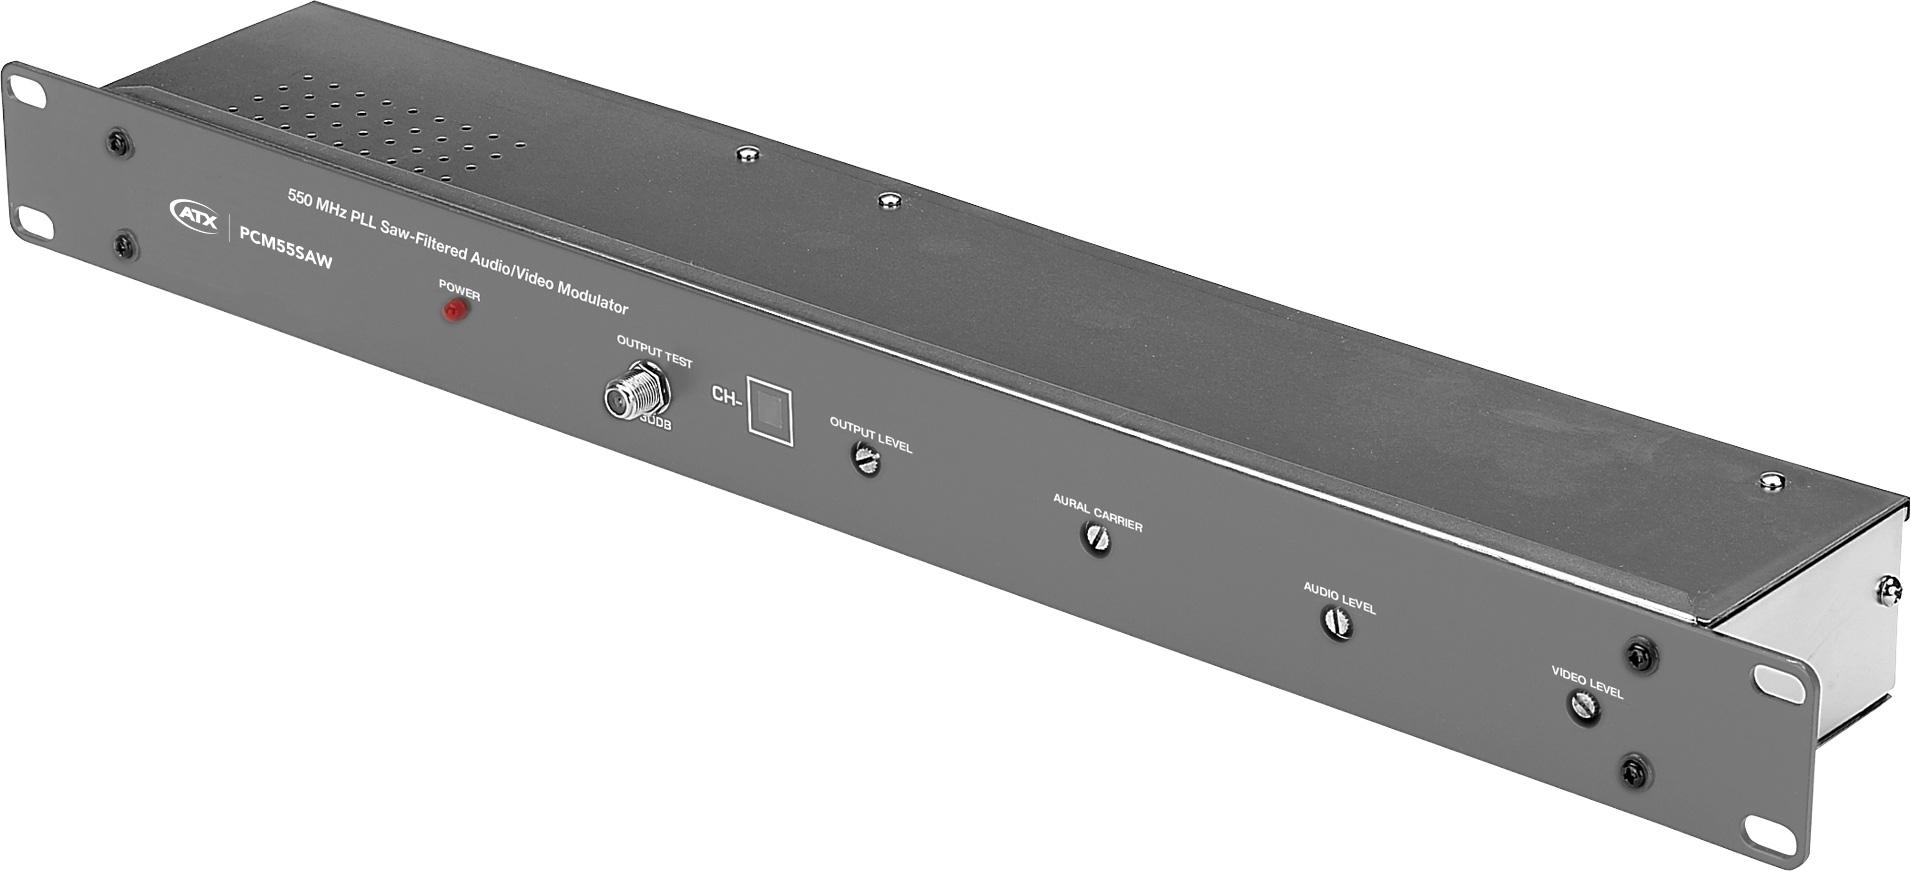 1 Channel Crystal A/V Modulator - Channel 4 PM-PCM55SAW-4